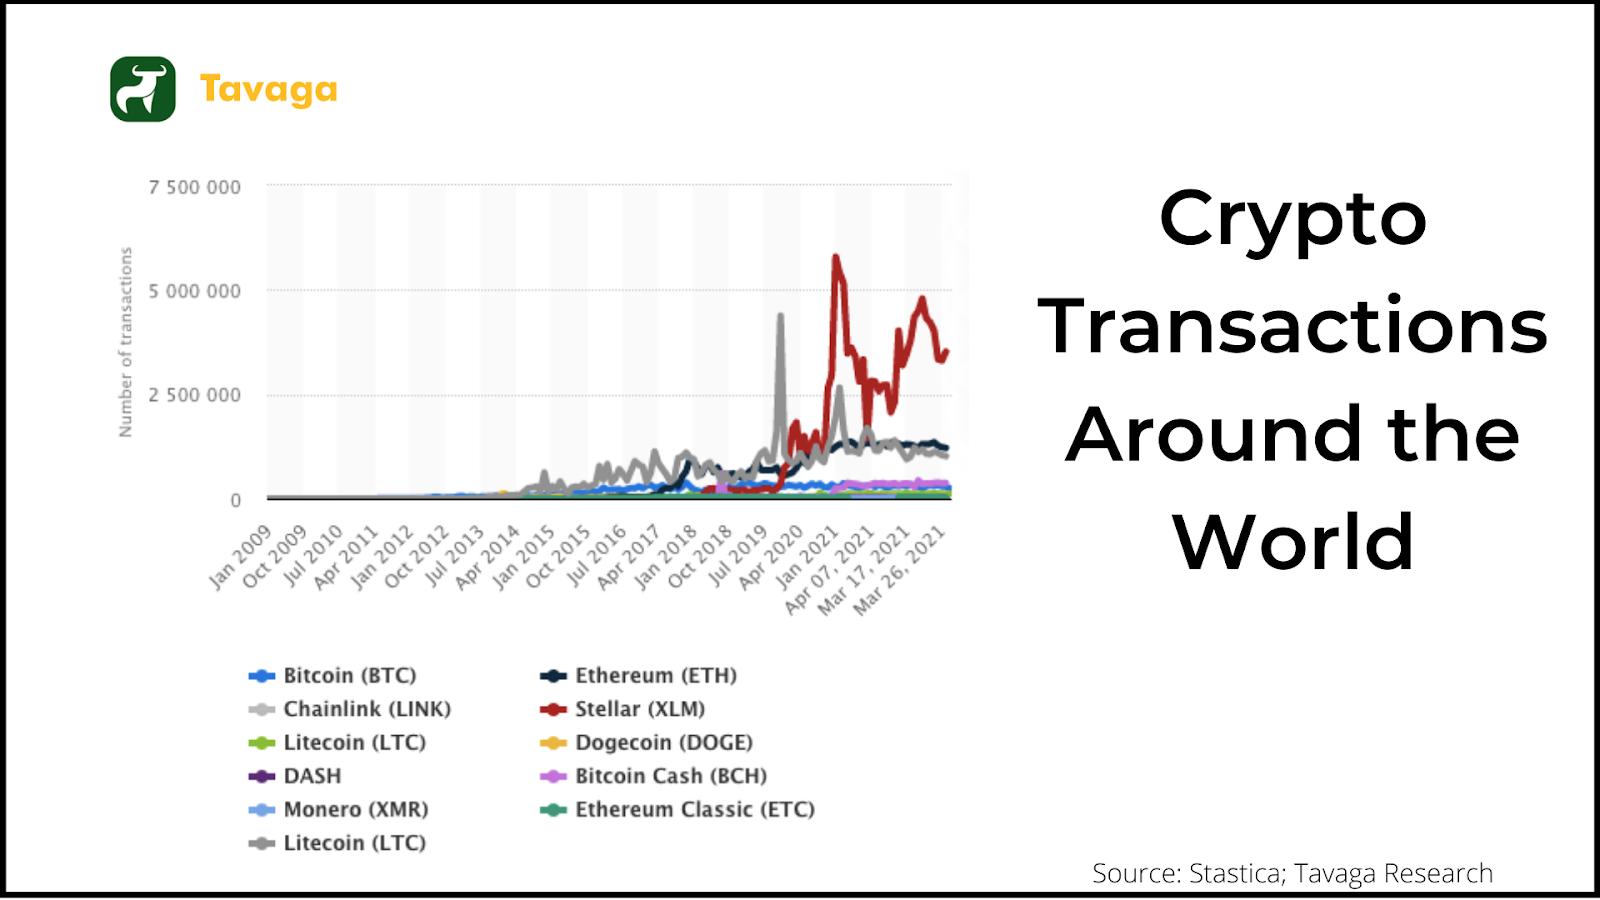 Crypto transactions around the world